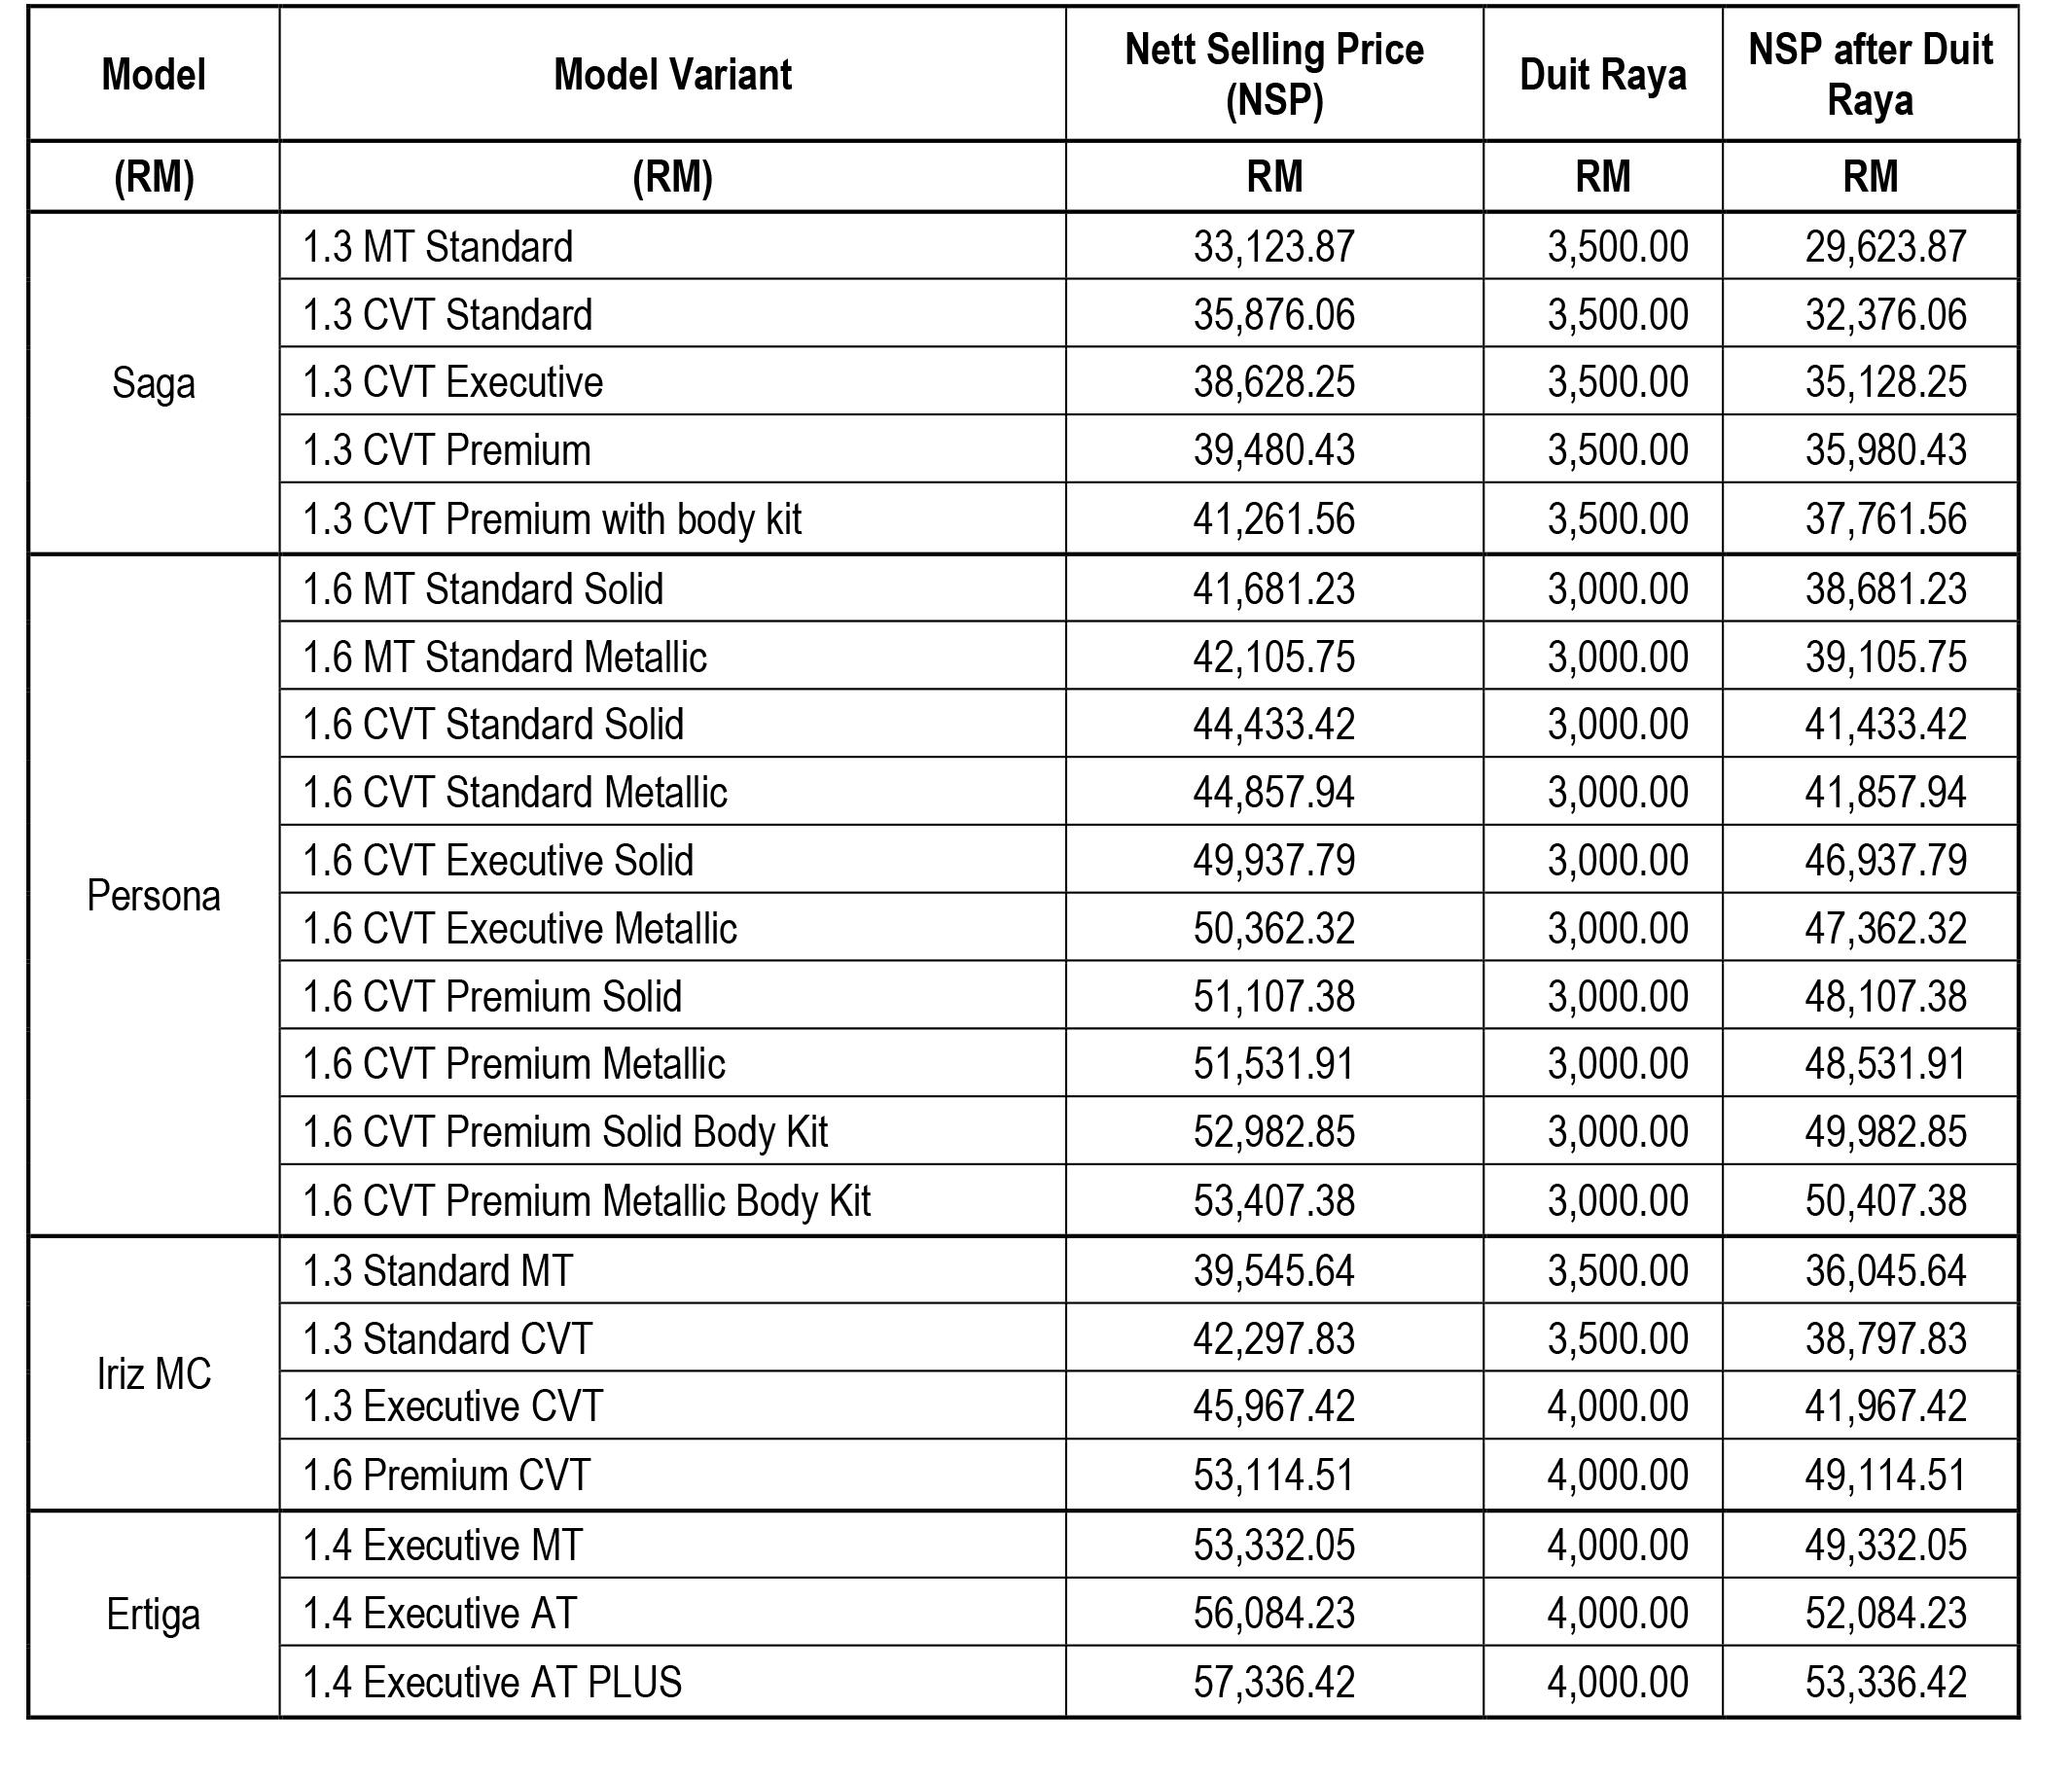 Proton 宣布 Duit Raya promotion, Saga 价格将低于3万令吉!